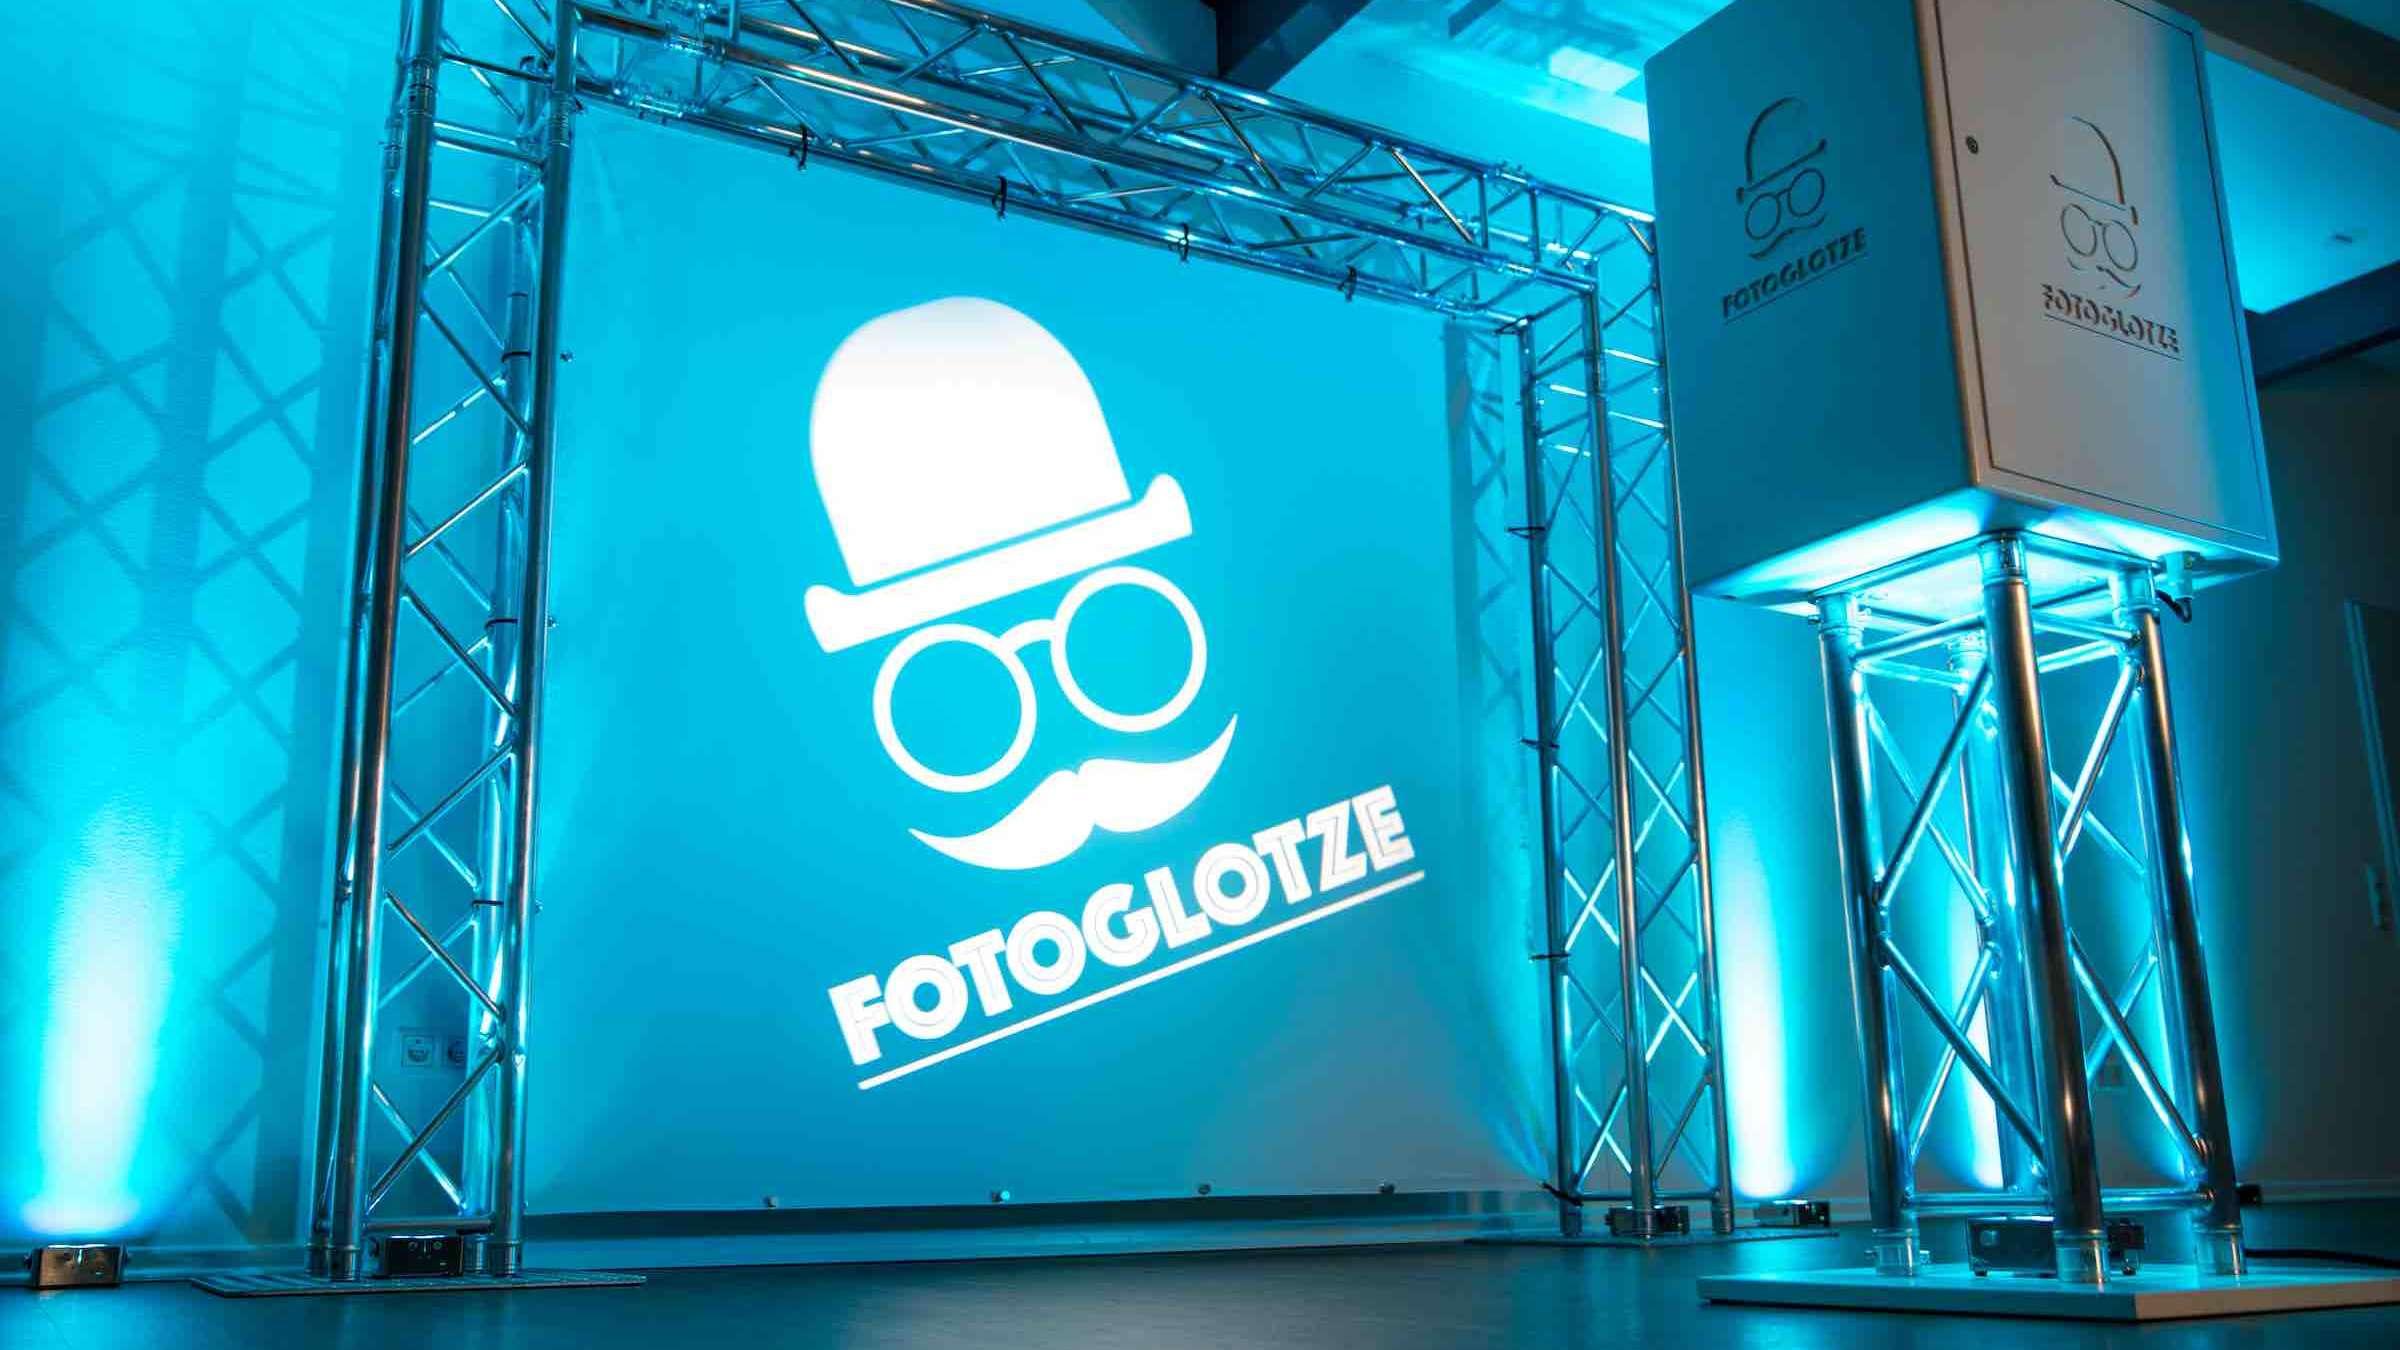 Lehmann |Eventservice |Partner |Fotoglotze |Fotokiste |Fotobooth |Fotobox |Photobooth |Fotoautomat |Hannover |Mieten |Buchen |Anfragen